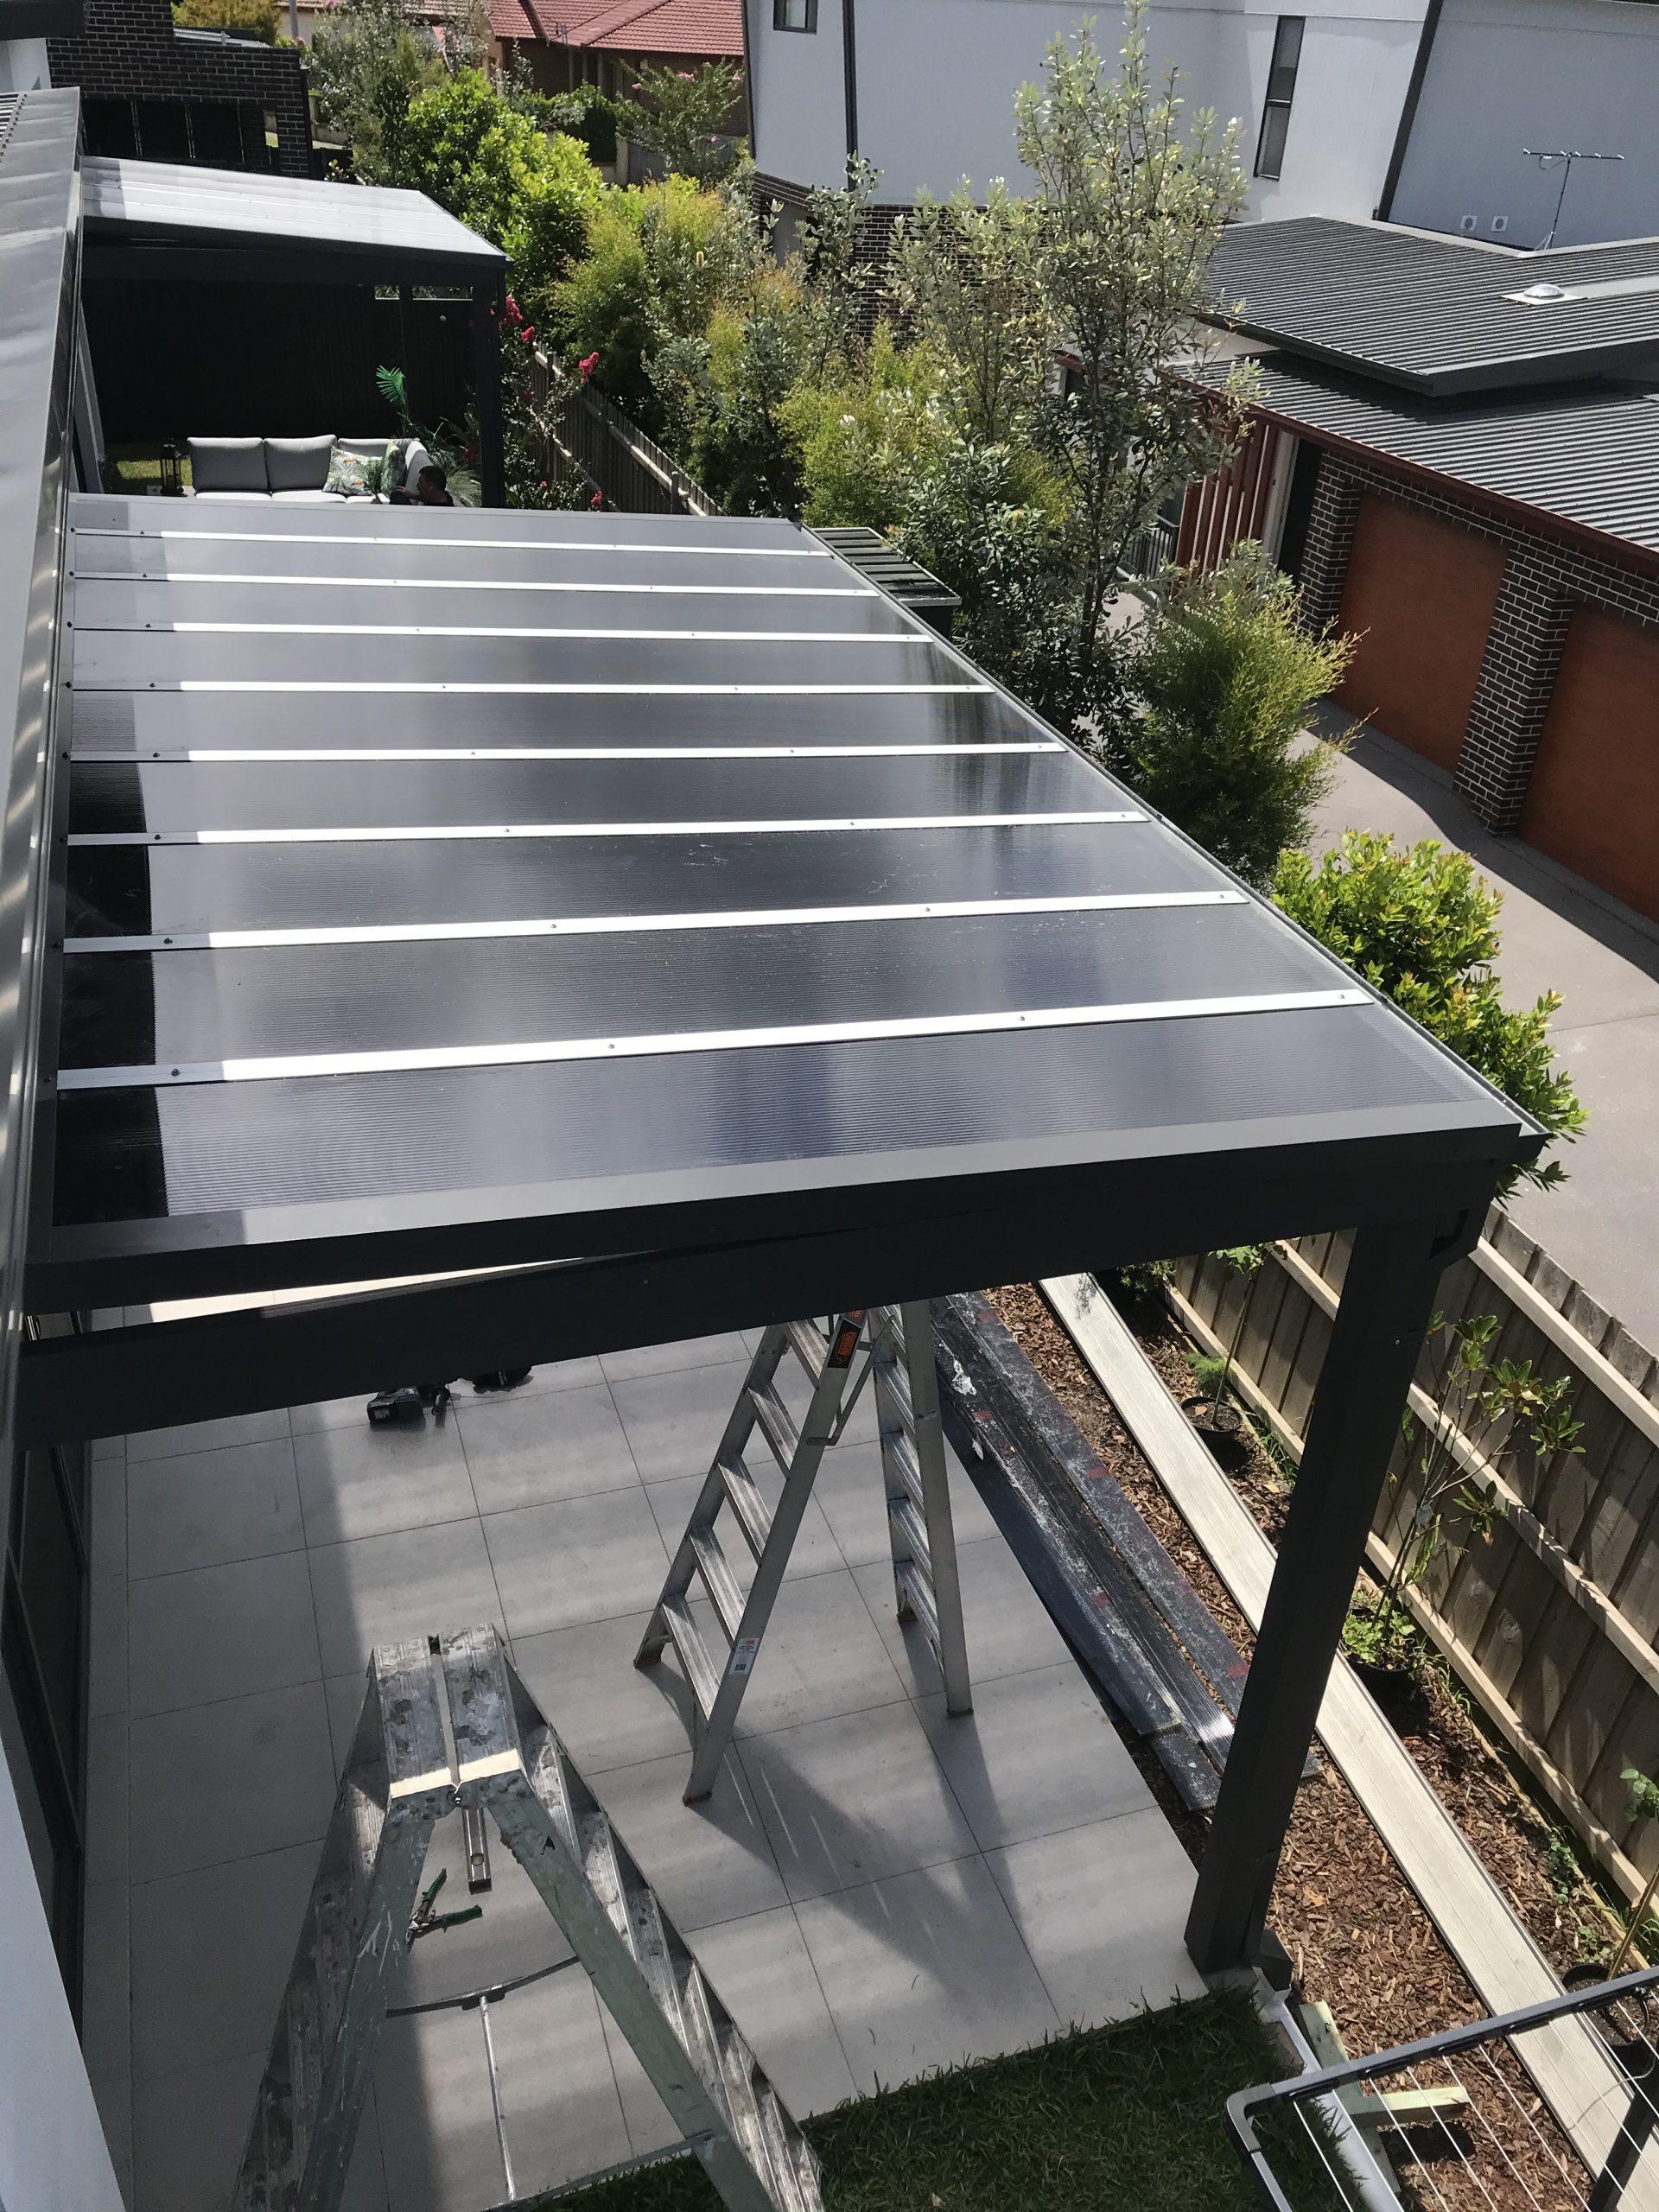 Mutliwall Polycarbonate roof Putney